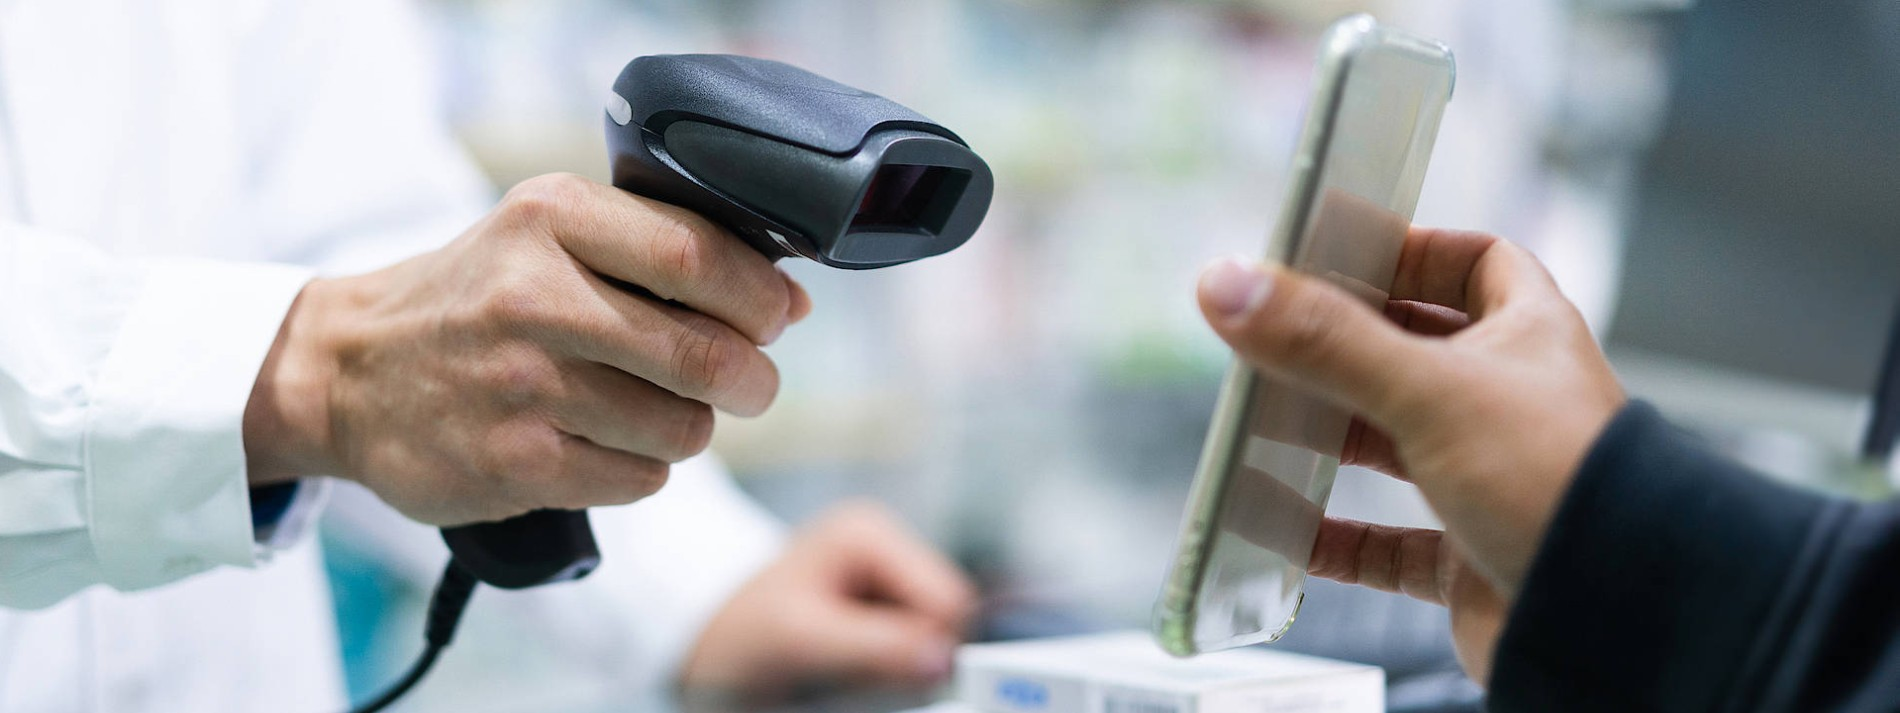 Medikament aus dem Smartphone